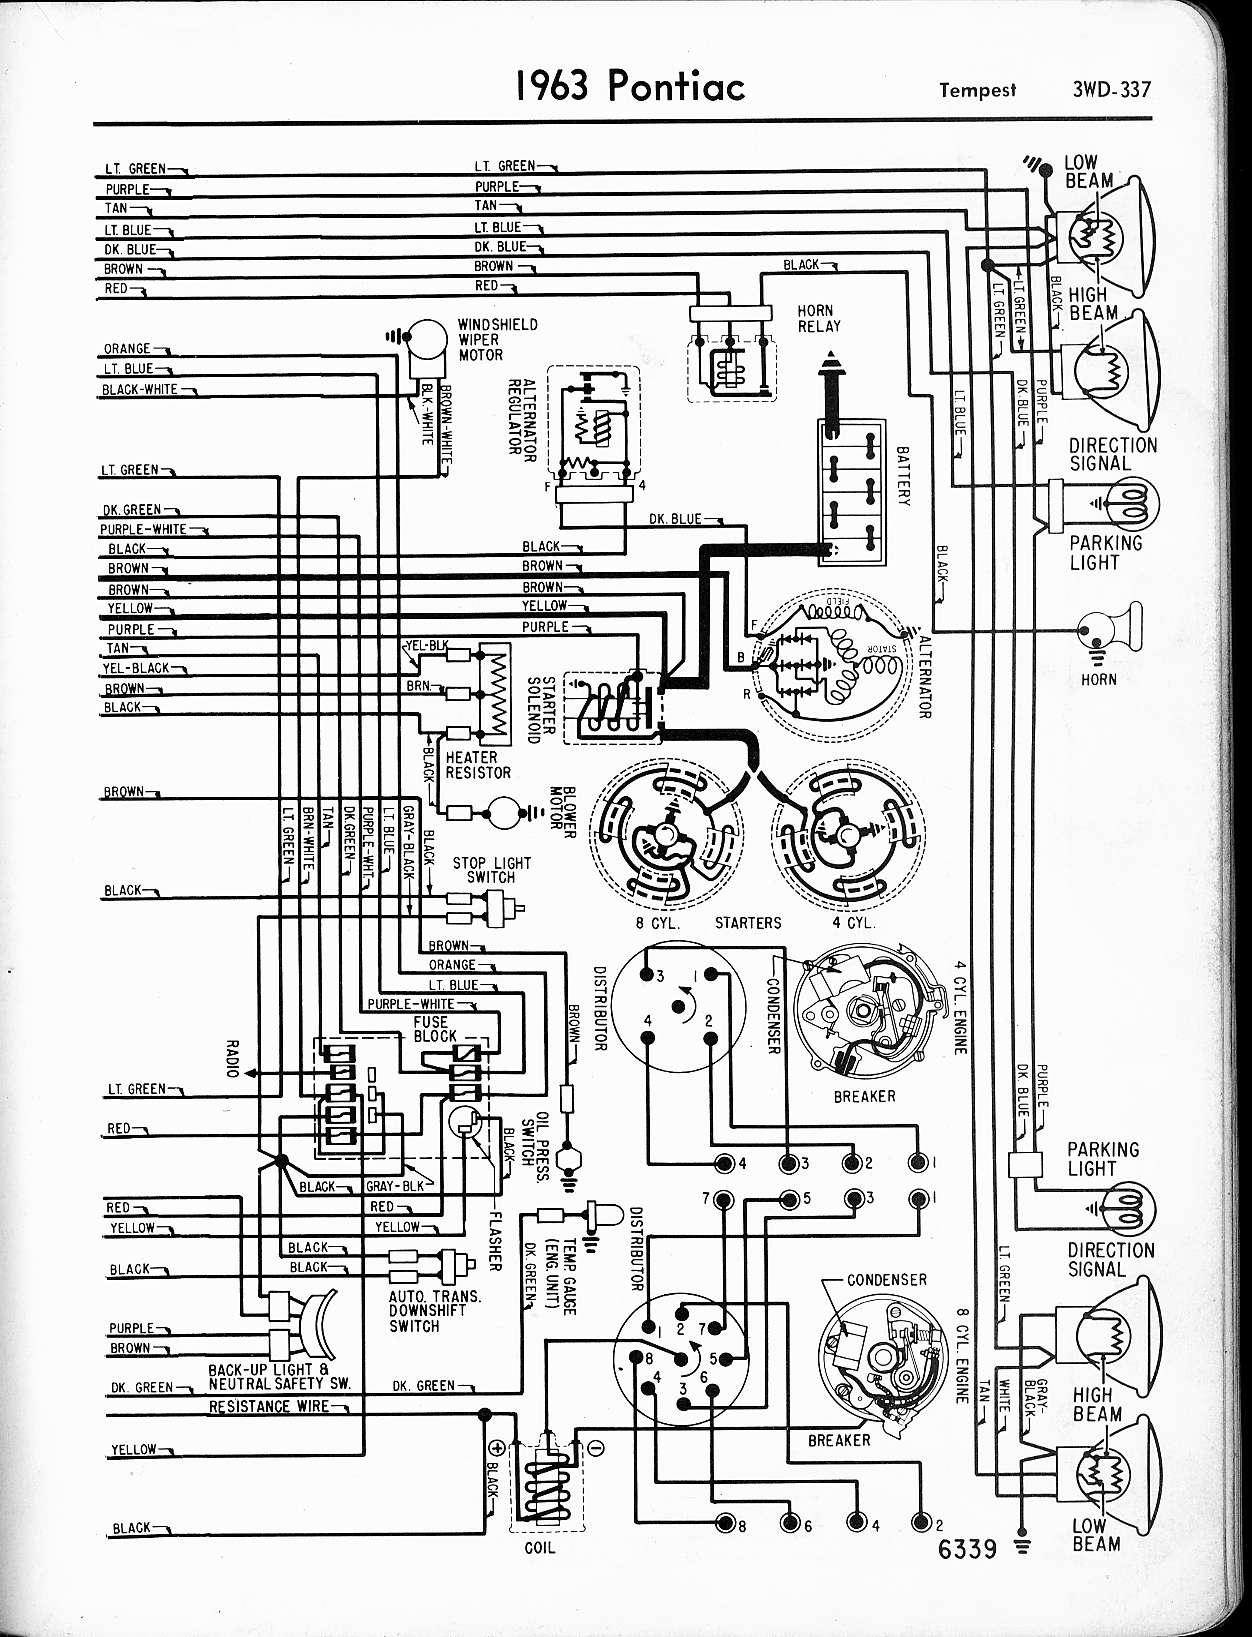 EO_8883] 1966 Impala Super Sport Wiring Diagram Download DiagramArivo Ynthe Waro Iness Vira Mohammedshrine Librar Wiring 101